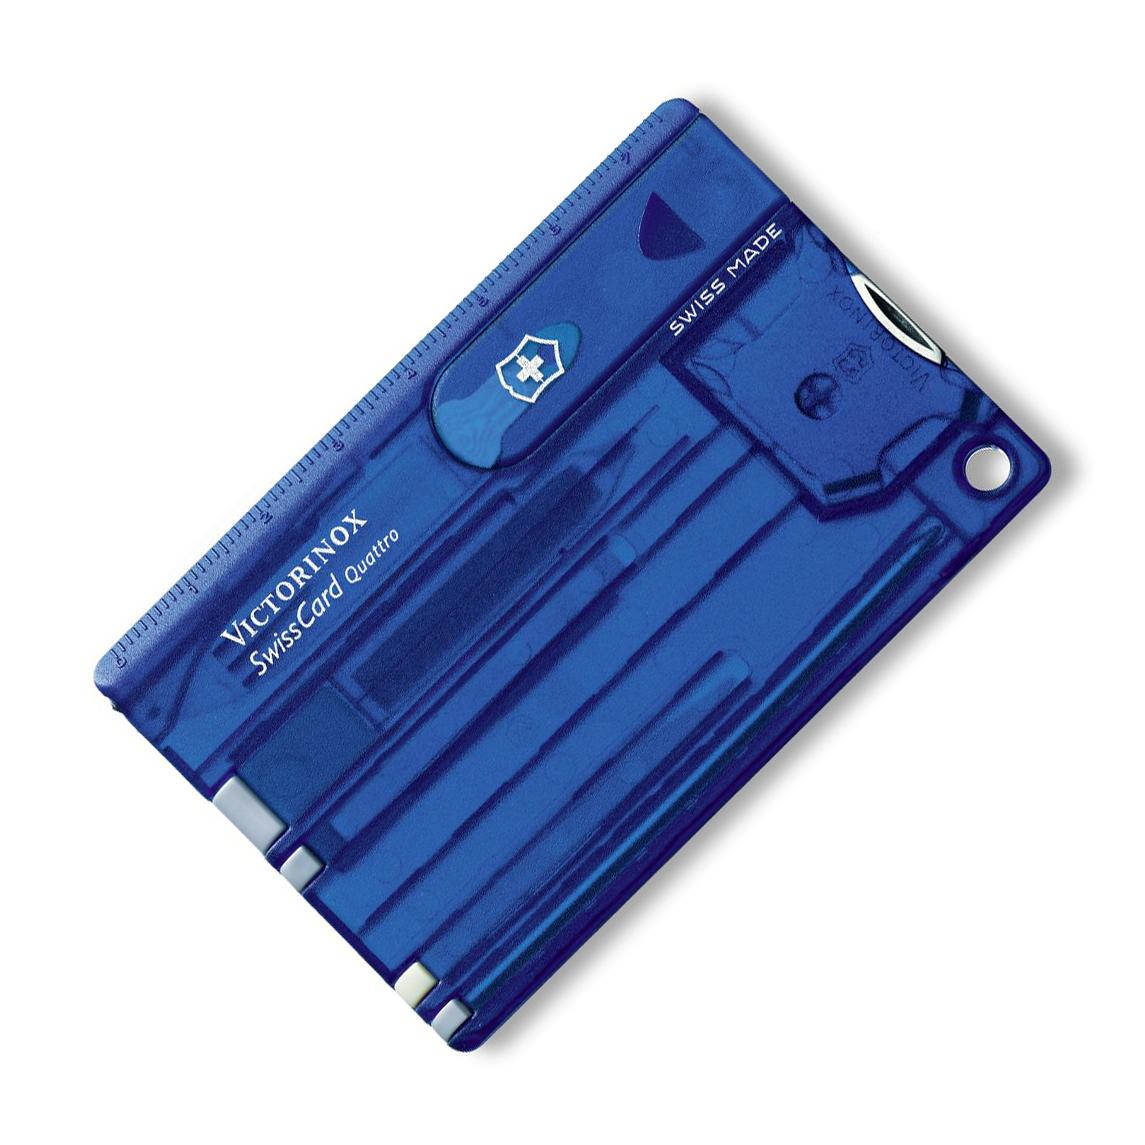 Швейцарская карта Victorinox SwissCard Quattro, сталь X50CrMoV15, рукоять ABS-Пластик, синий